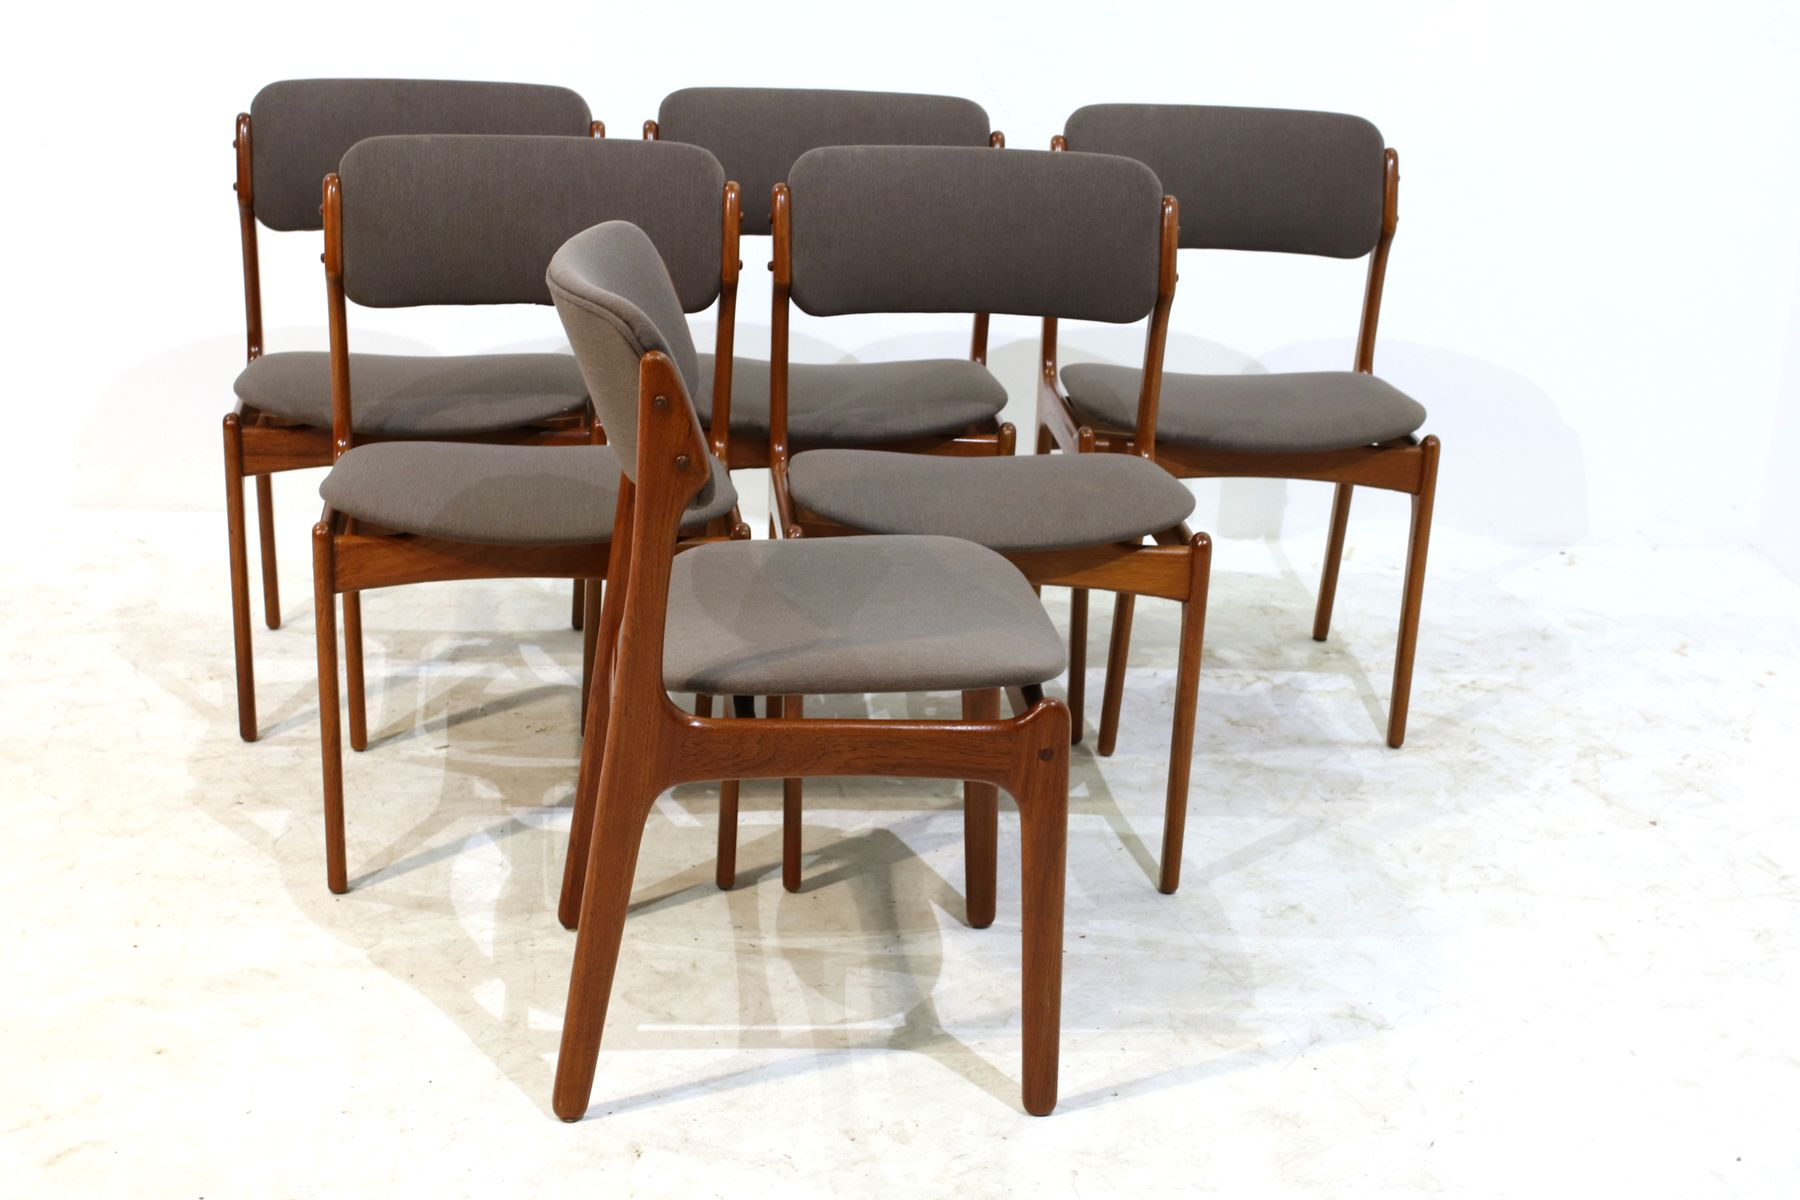 Teak Dining Chairs by Erik Buch for Oddense Maskinsnedkeri A S